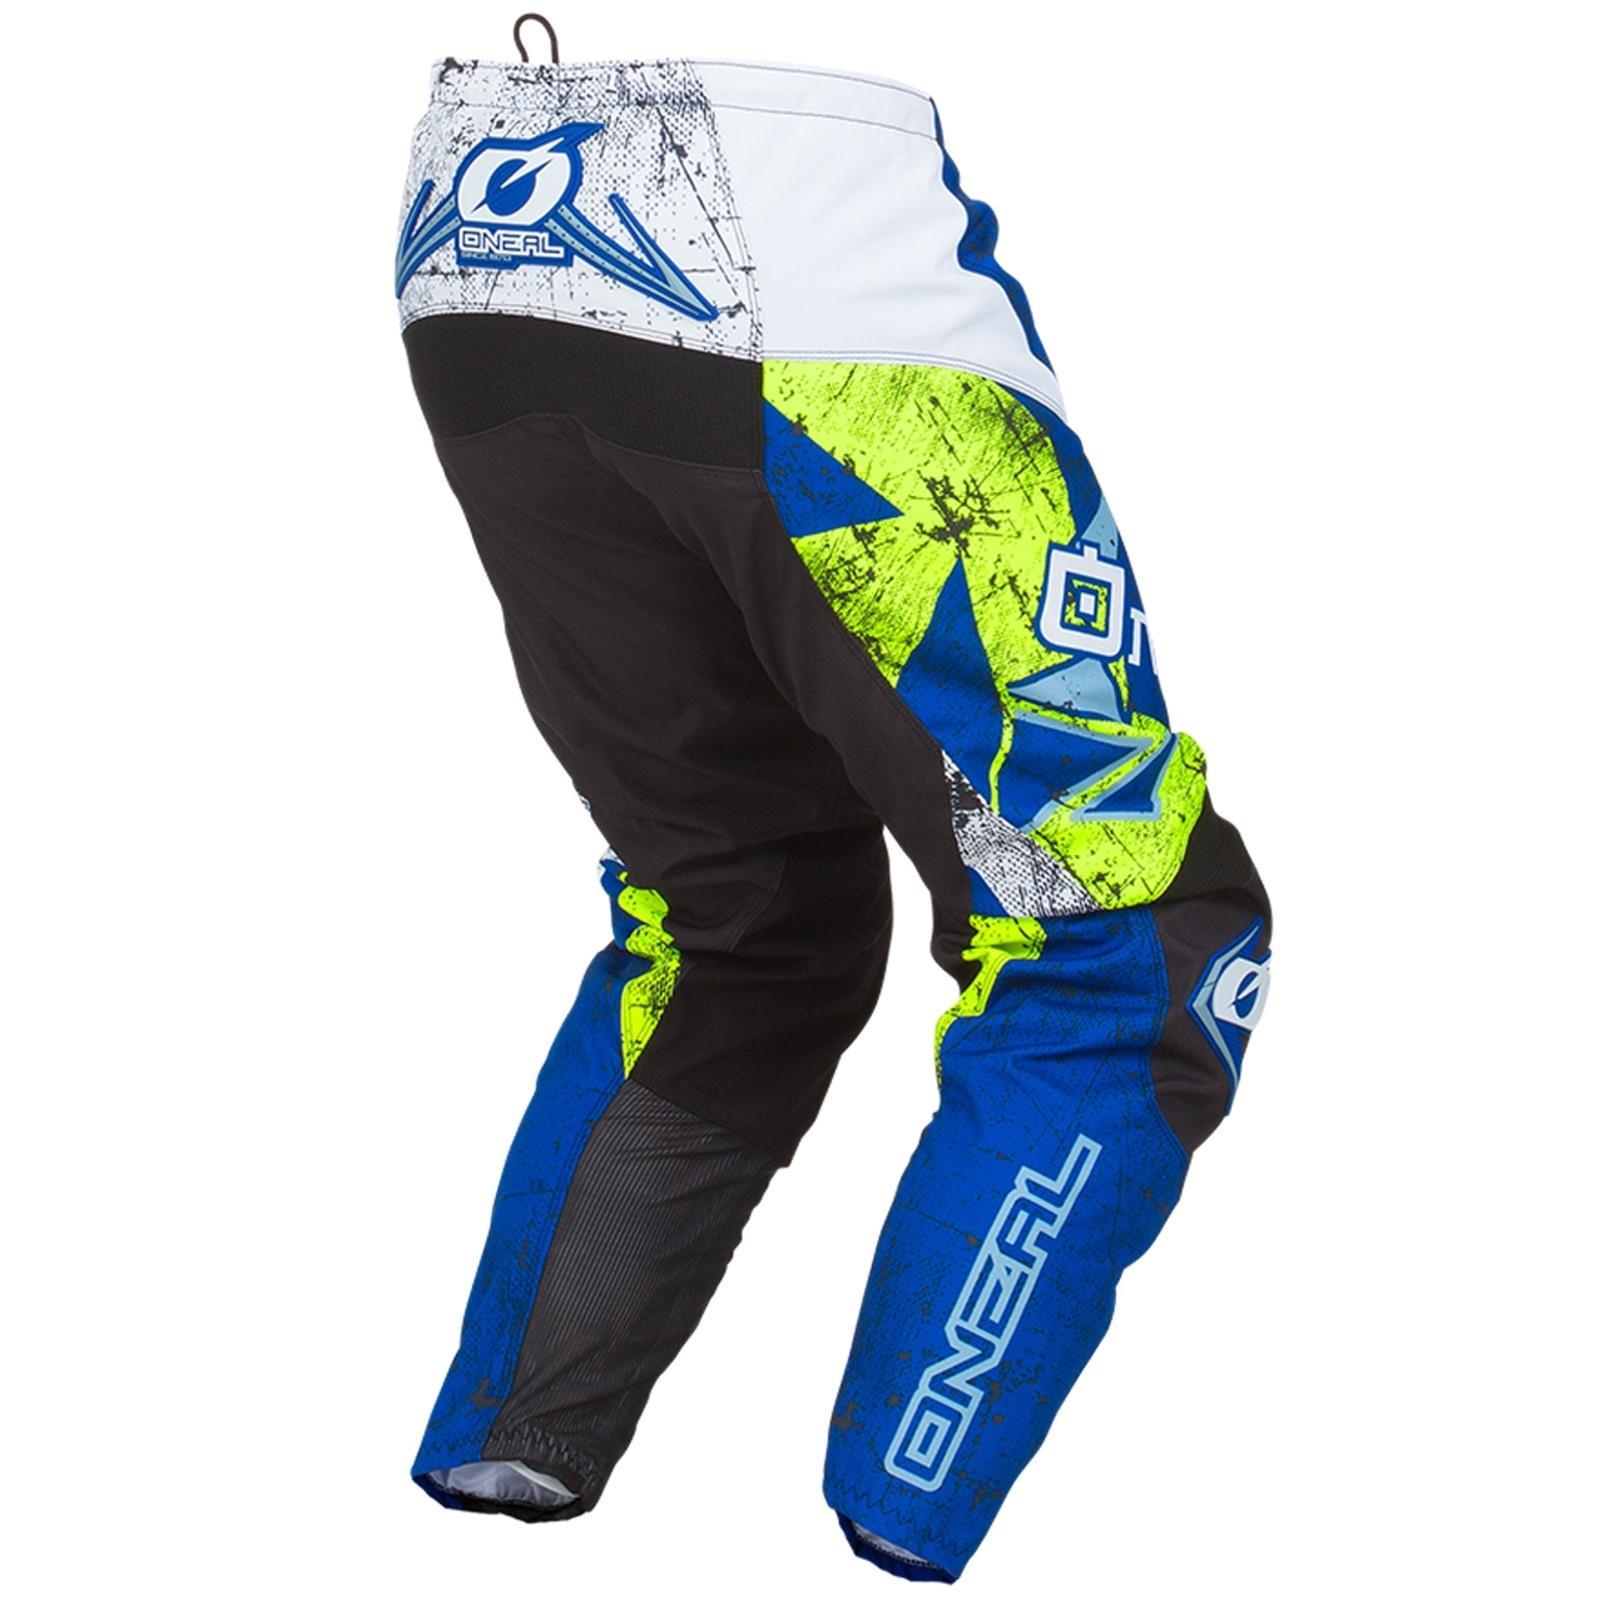 Oneal-elemento-Mayhem-Hardwear-Pants-pantalones-MX-DH-FR-Moto-Cross-Enduro-MTB-moto miniatura 37